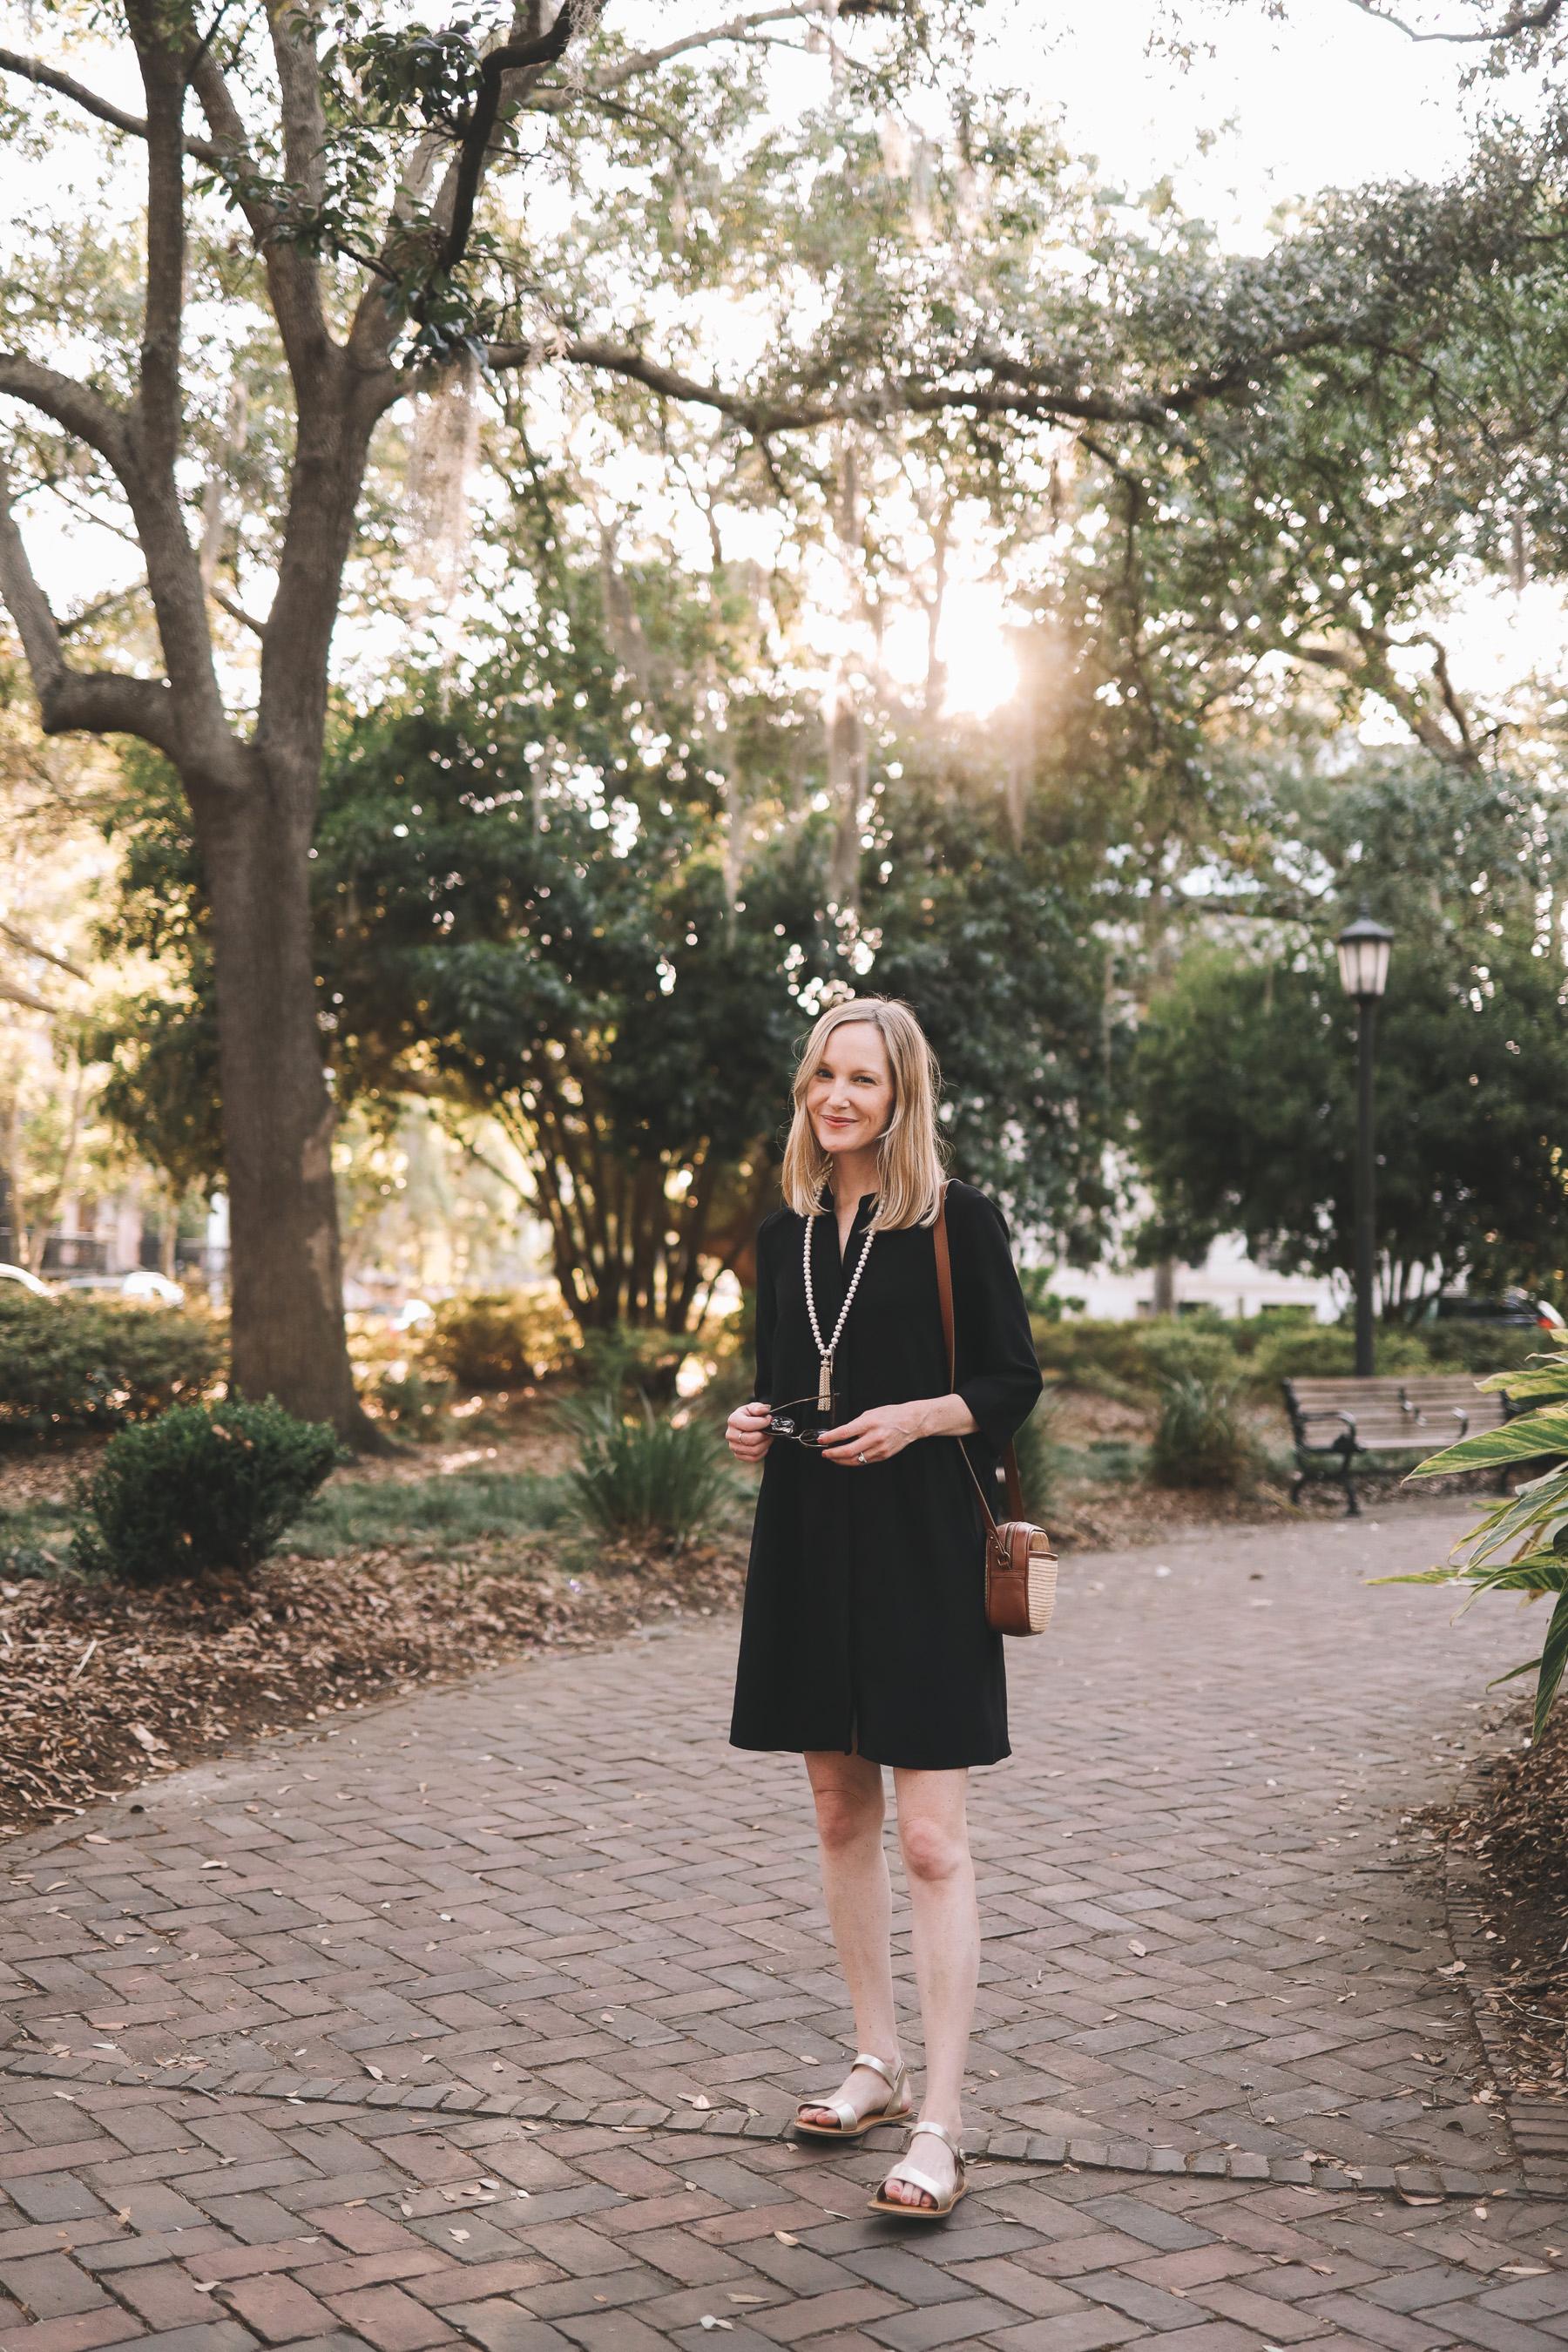 Savannah in Three Days Itinerary